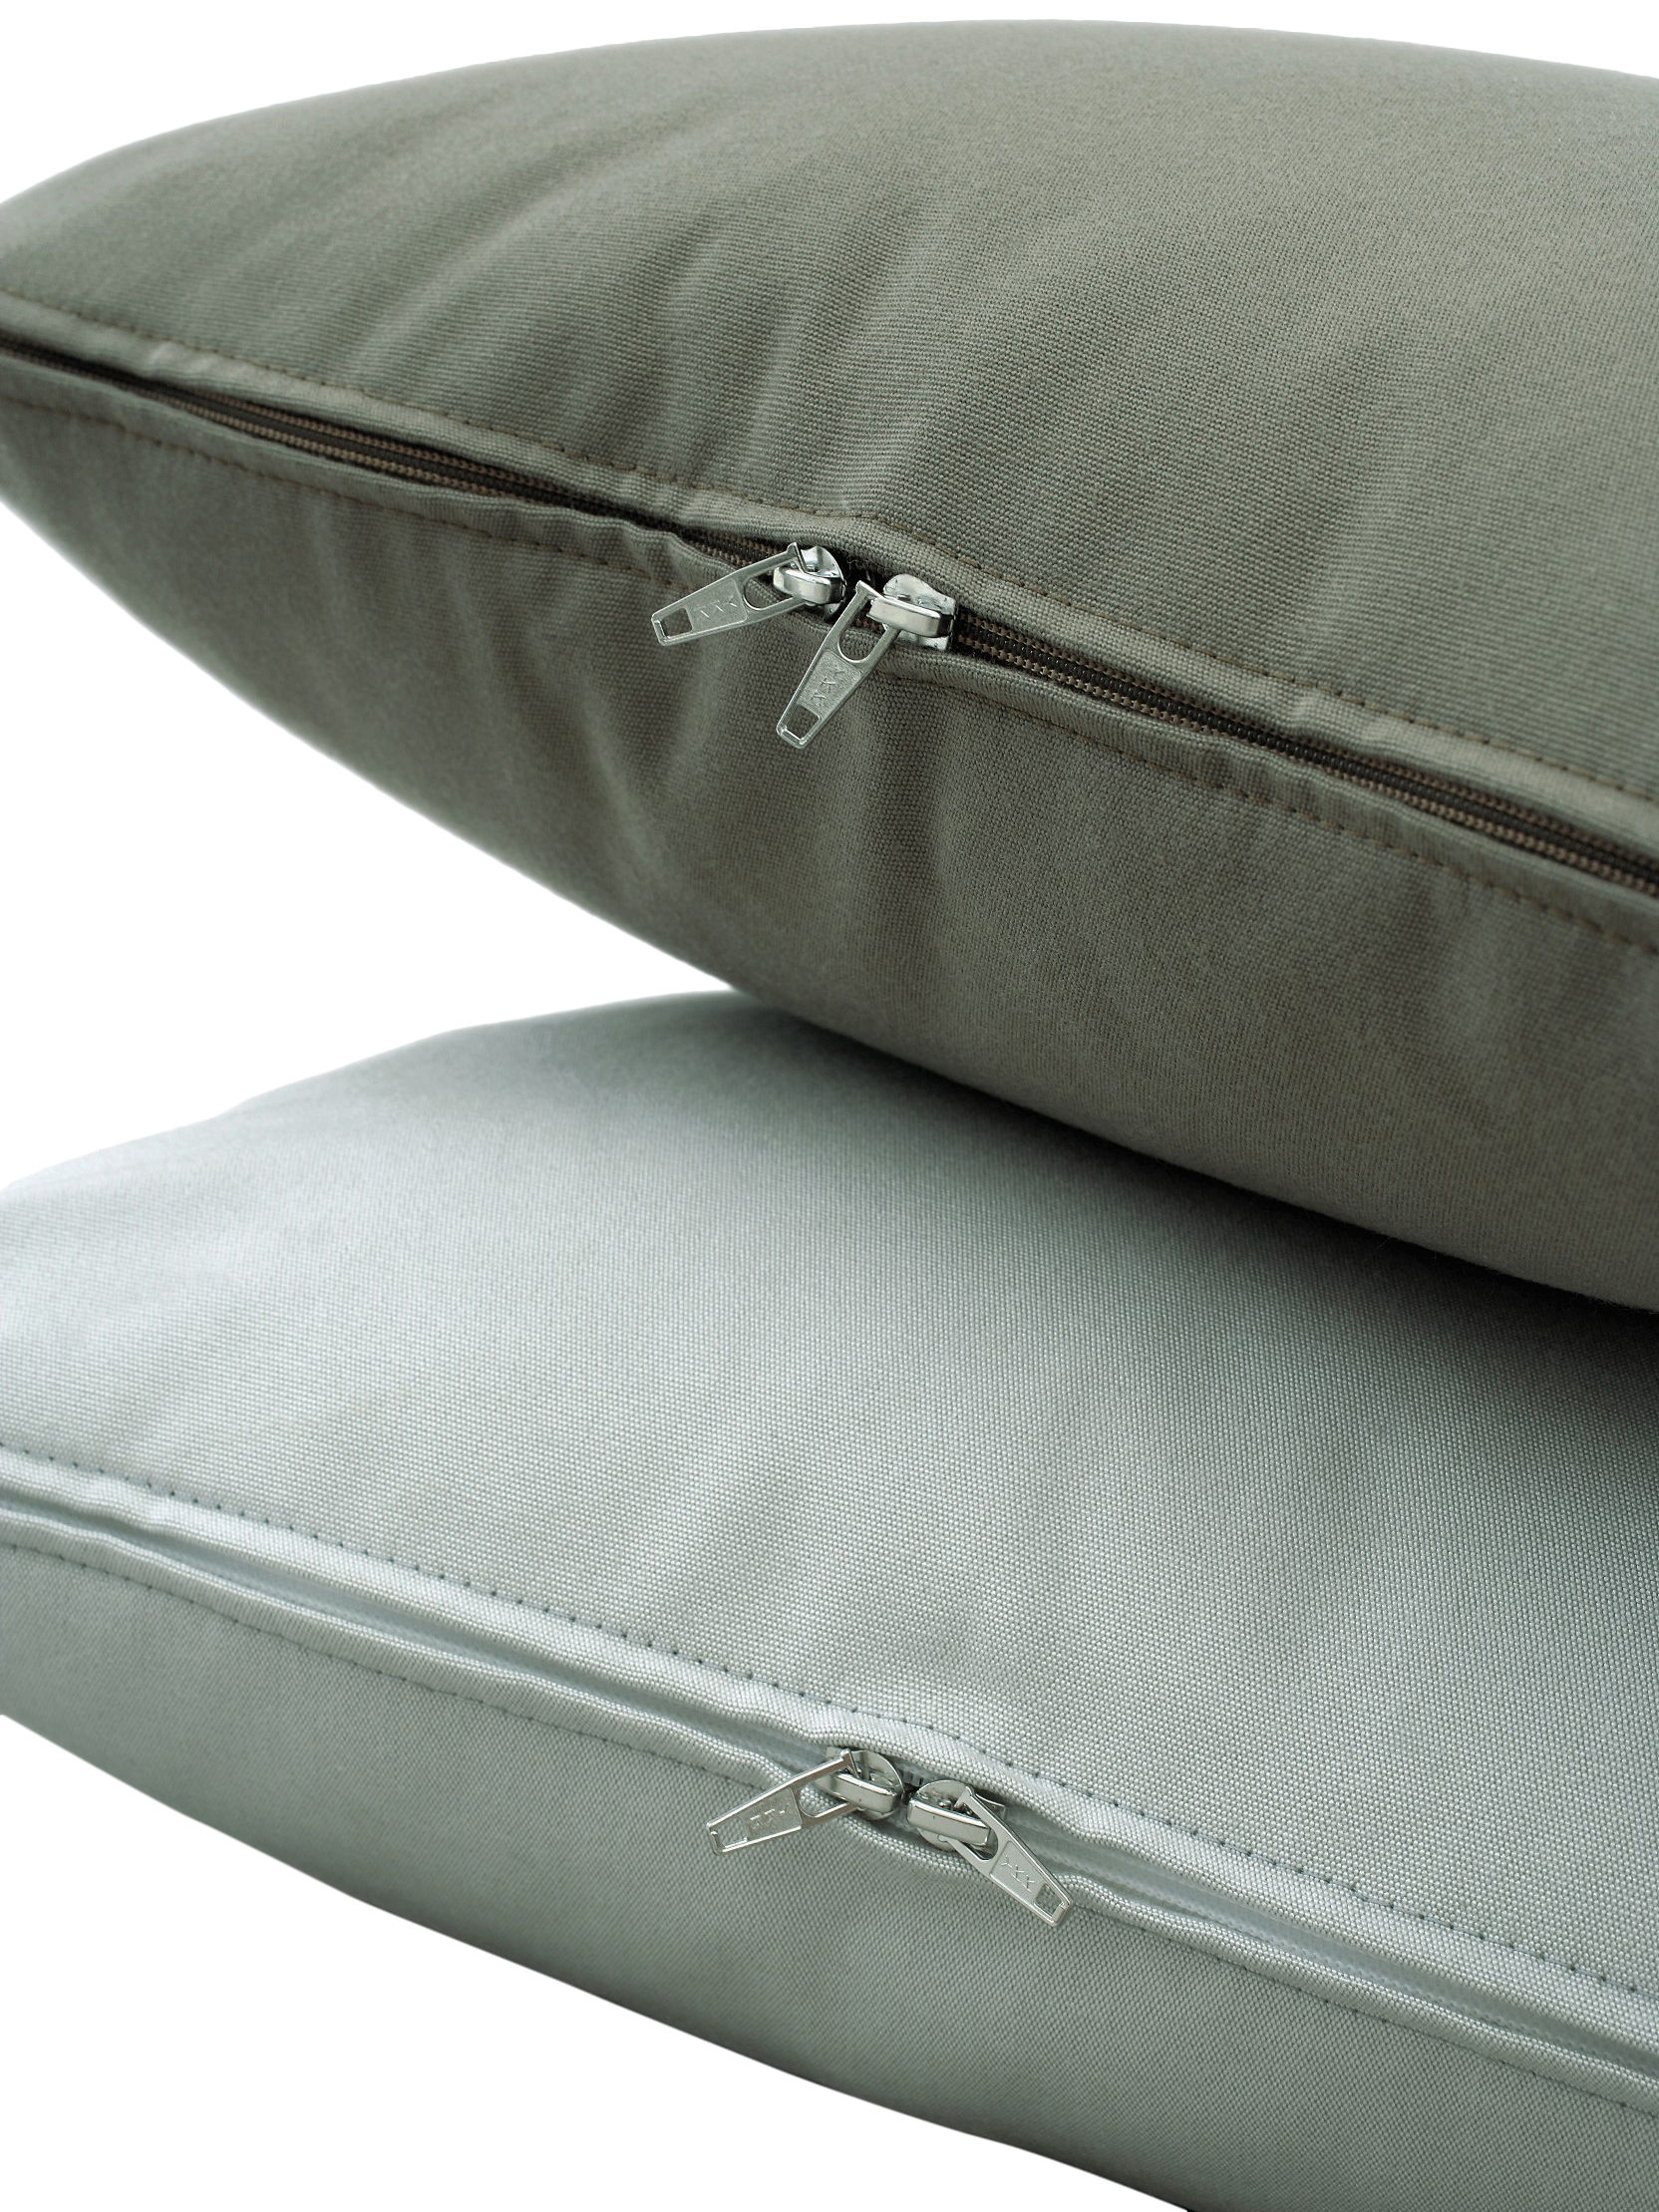 coussin d 39 assise pour canap transatlantik coussin taupe sifas. Black Bedroom Furniture Sets. Home Design Ideas